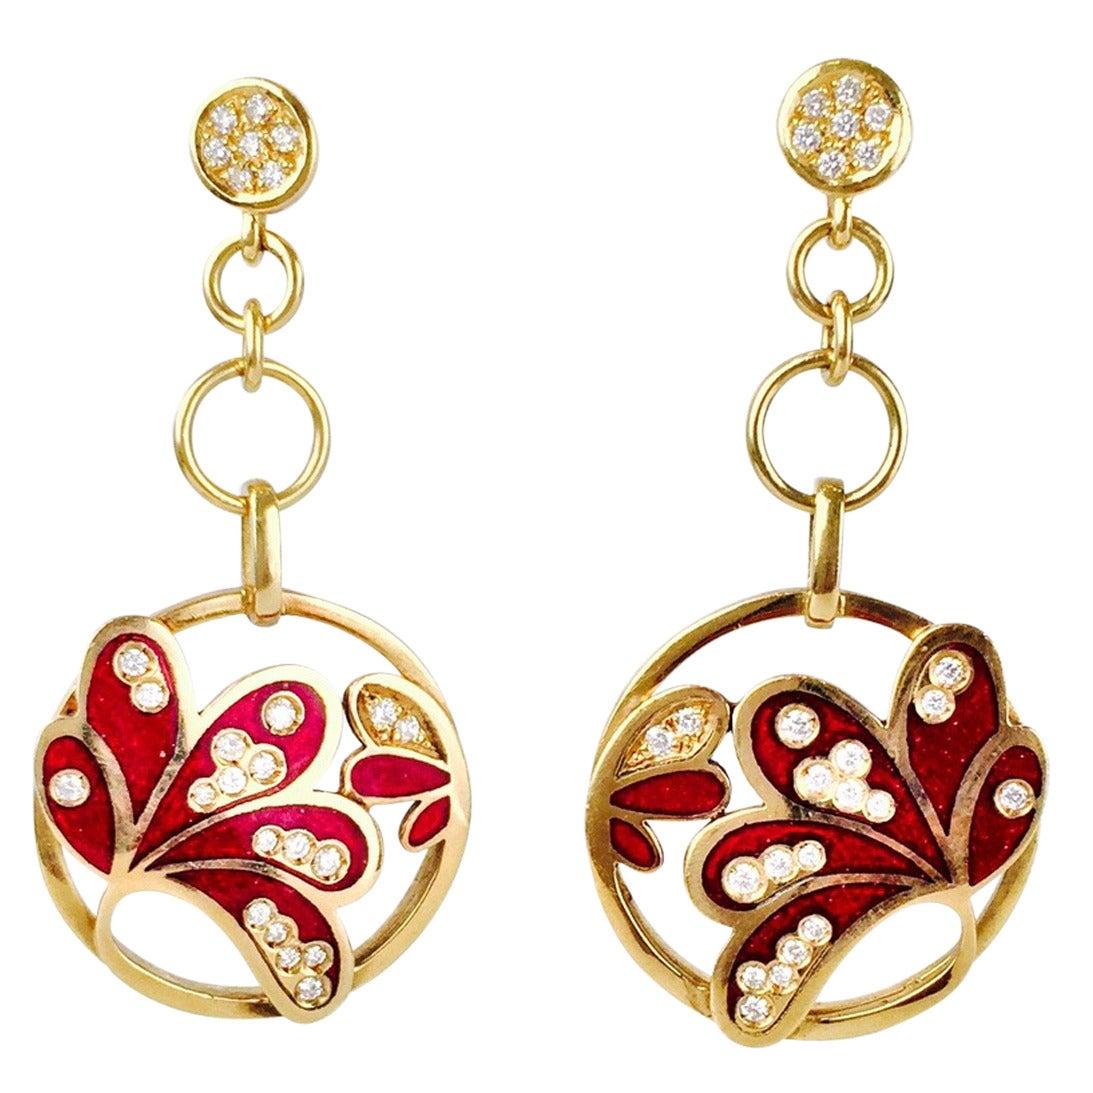 Allesandro Fanfani Enamel Diamond Gold Dangle Earrings 1